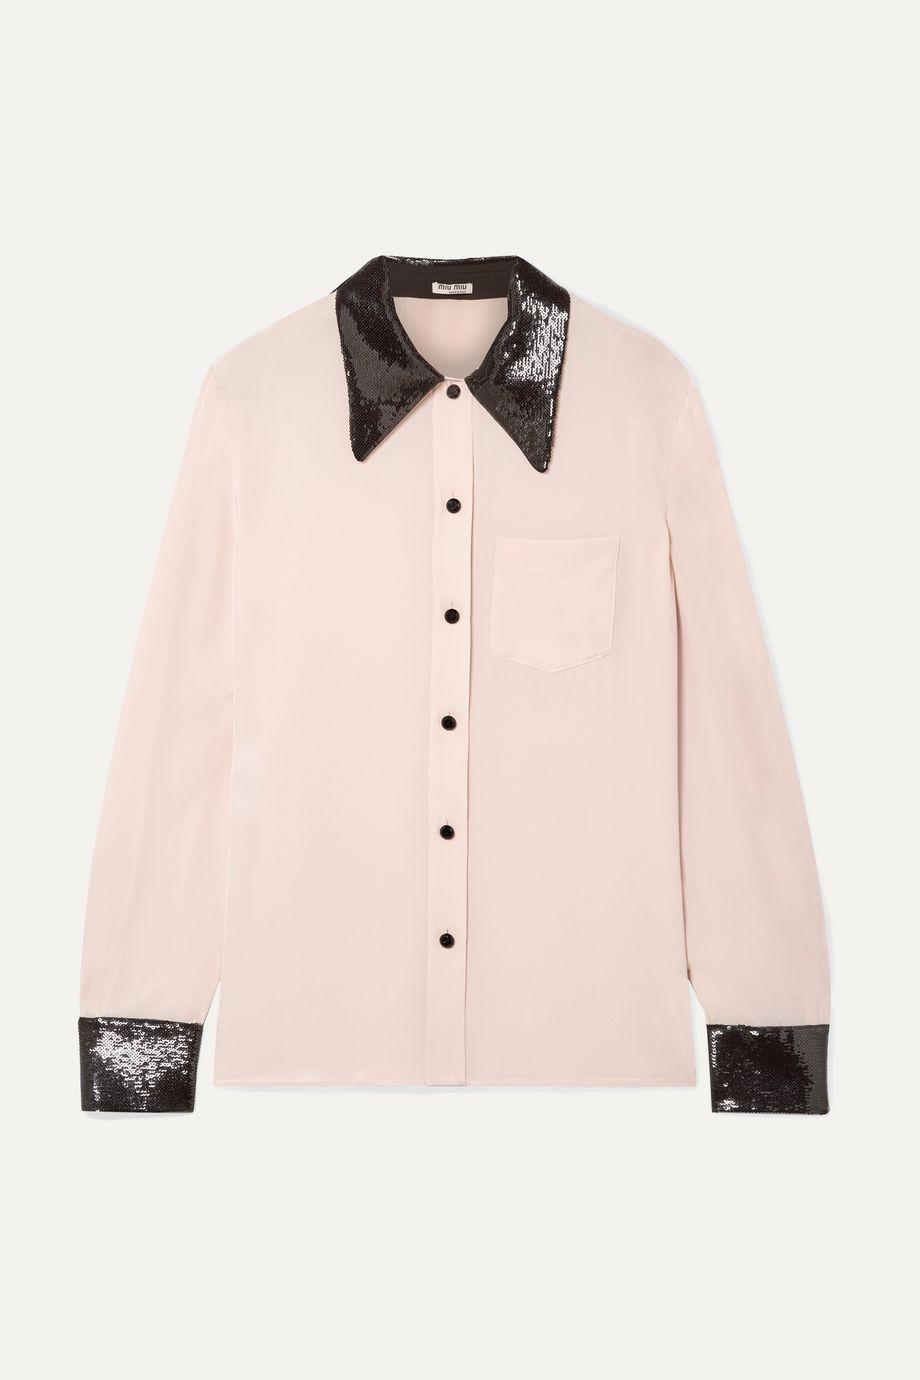 Miu Miu Sequined silk crepe de chine shirt